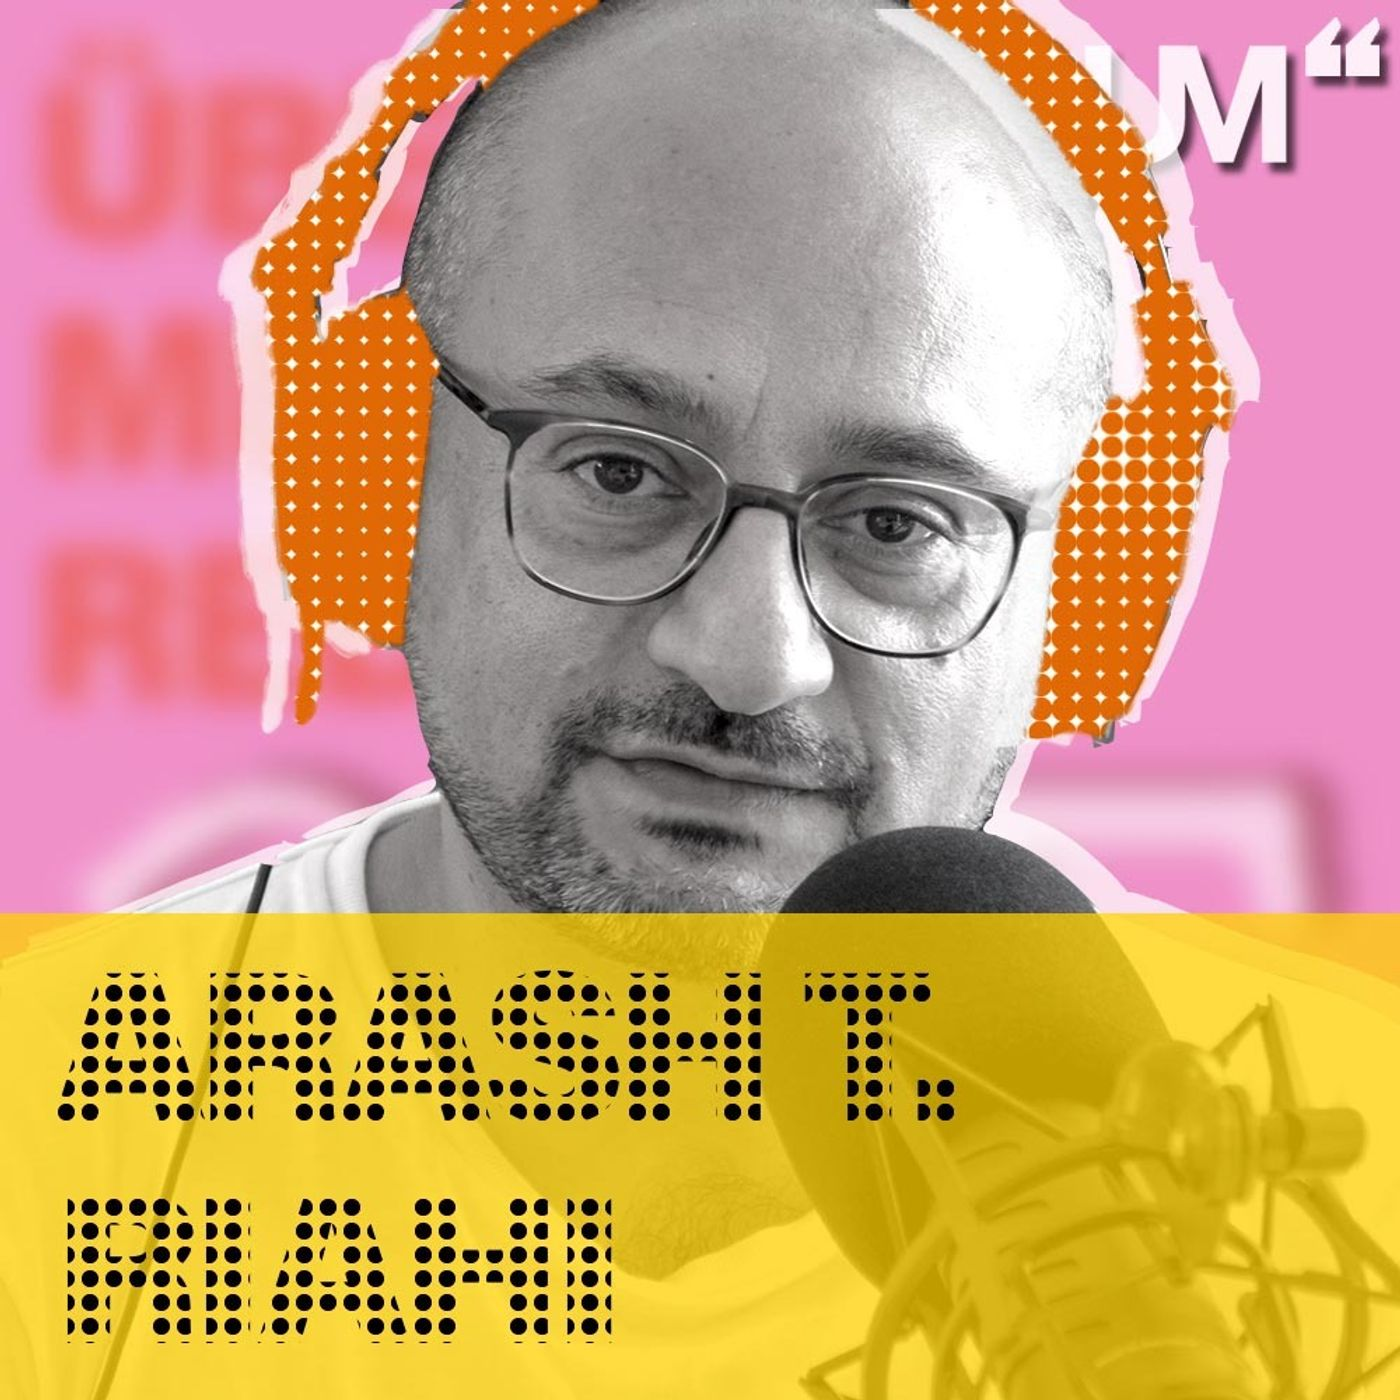 # 37 Arash T. Riahi: Von Golden Girls & Filmregie   03.10.20